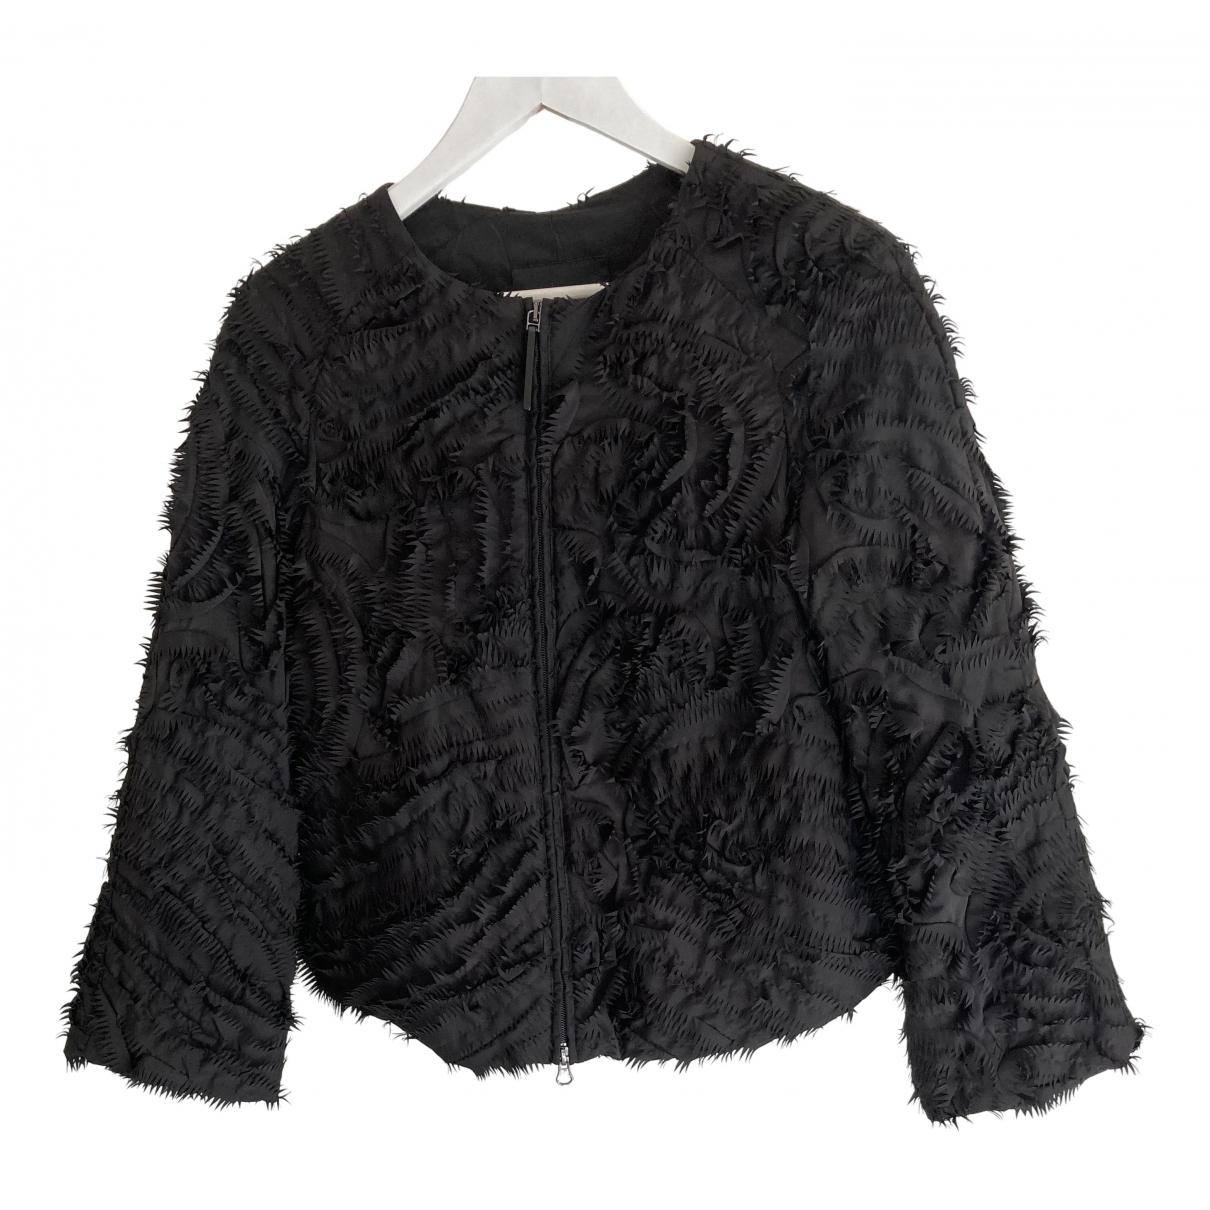 Emporio Armani \N Black jacket for Women S International